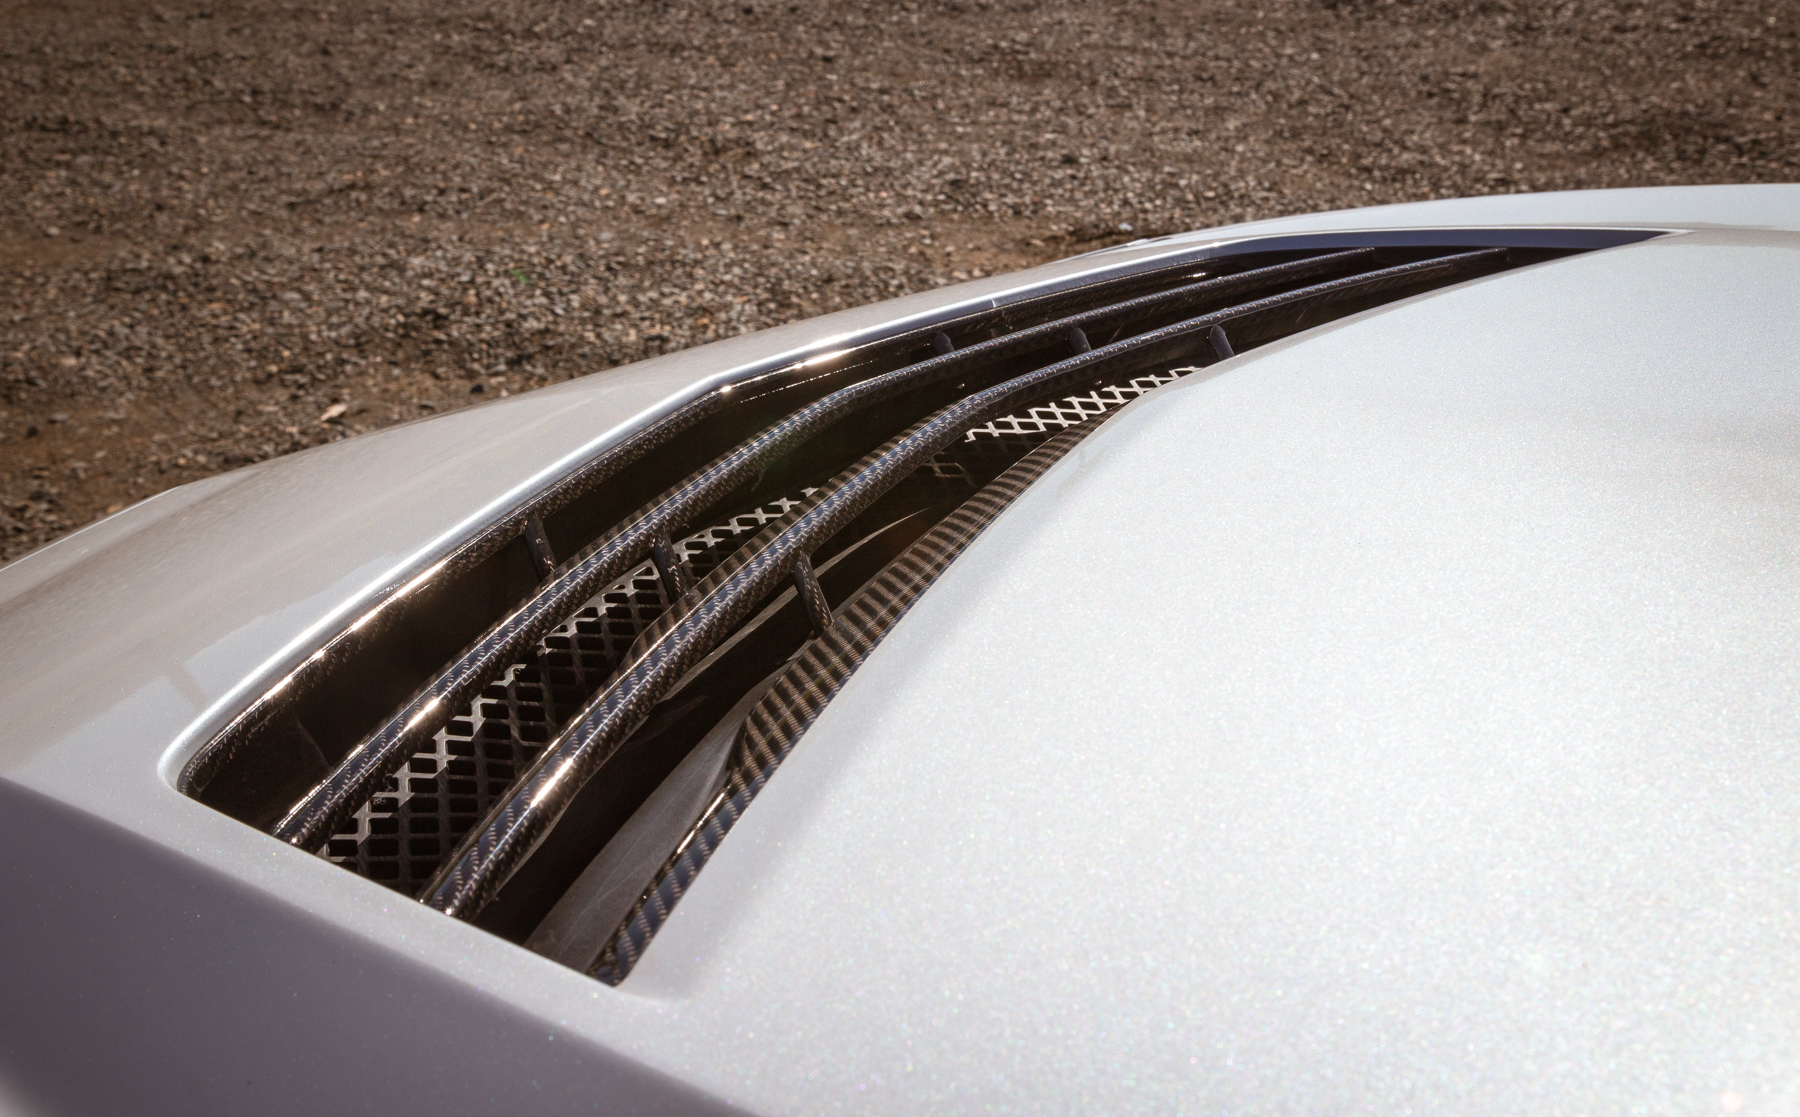 2017 cadillac cts v manual transmission